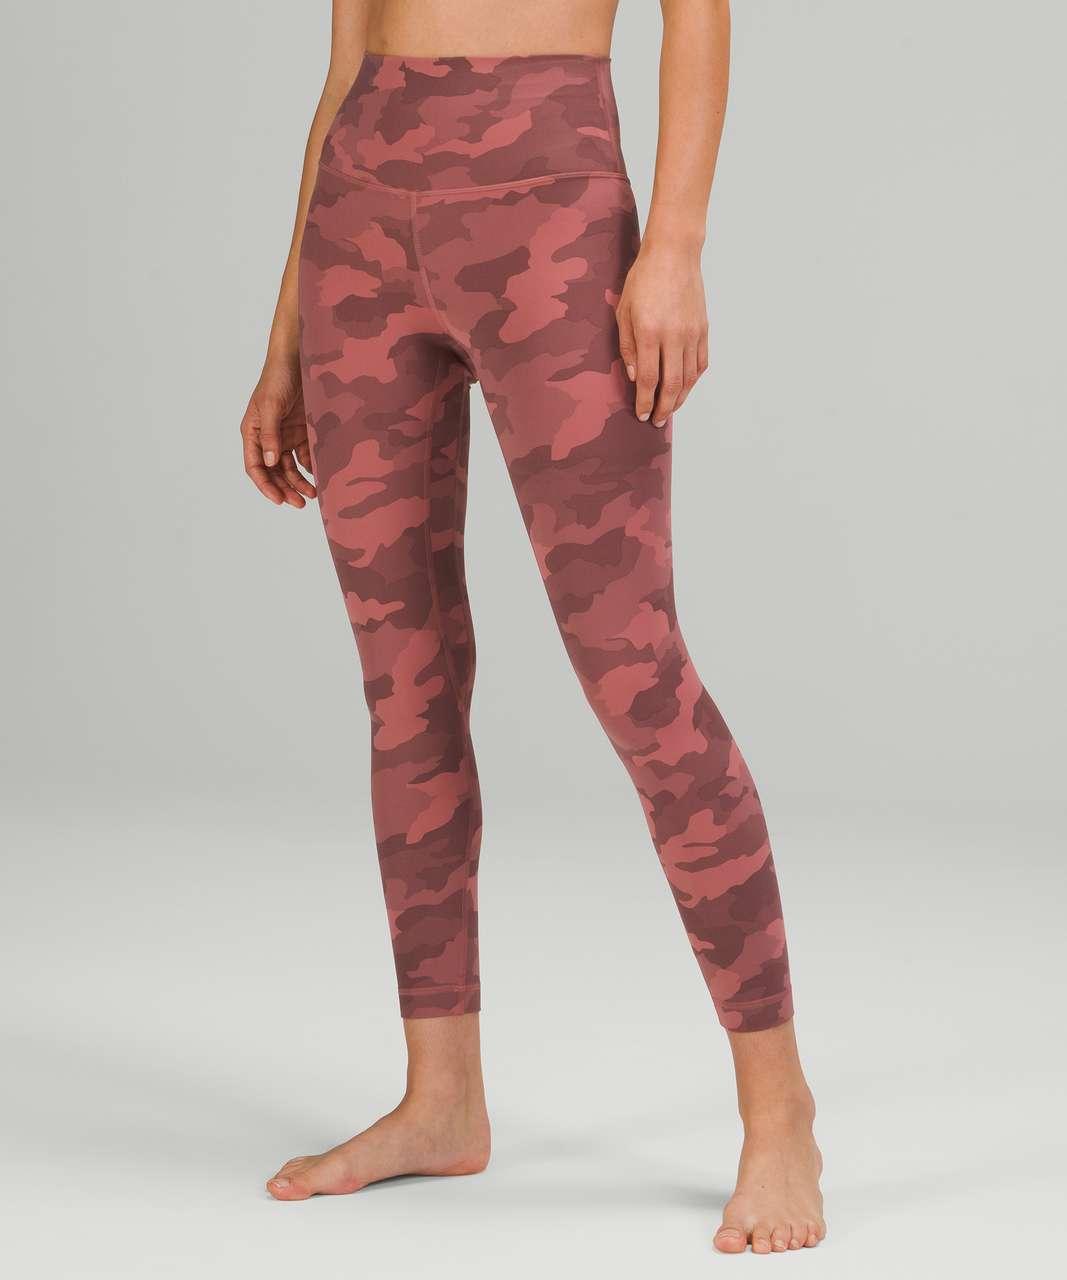 "Lululemon Align High-Rise Pant 25"" - Heritage 365 Camo Brier Rose Multi"